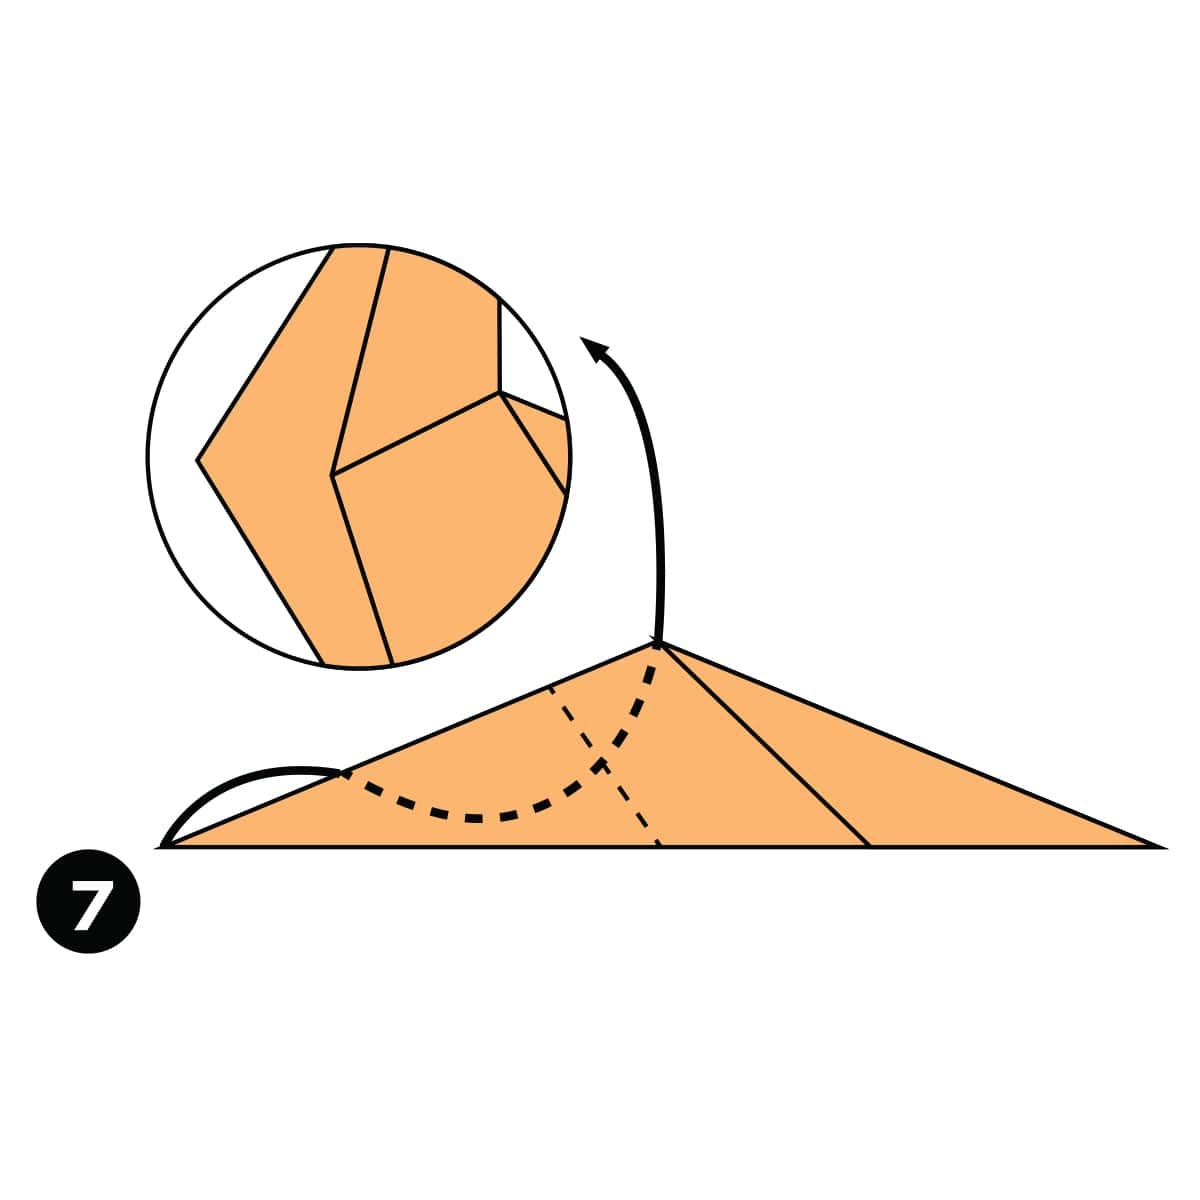 Horse Step 7